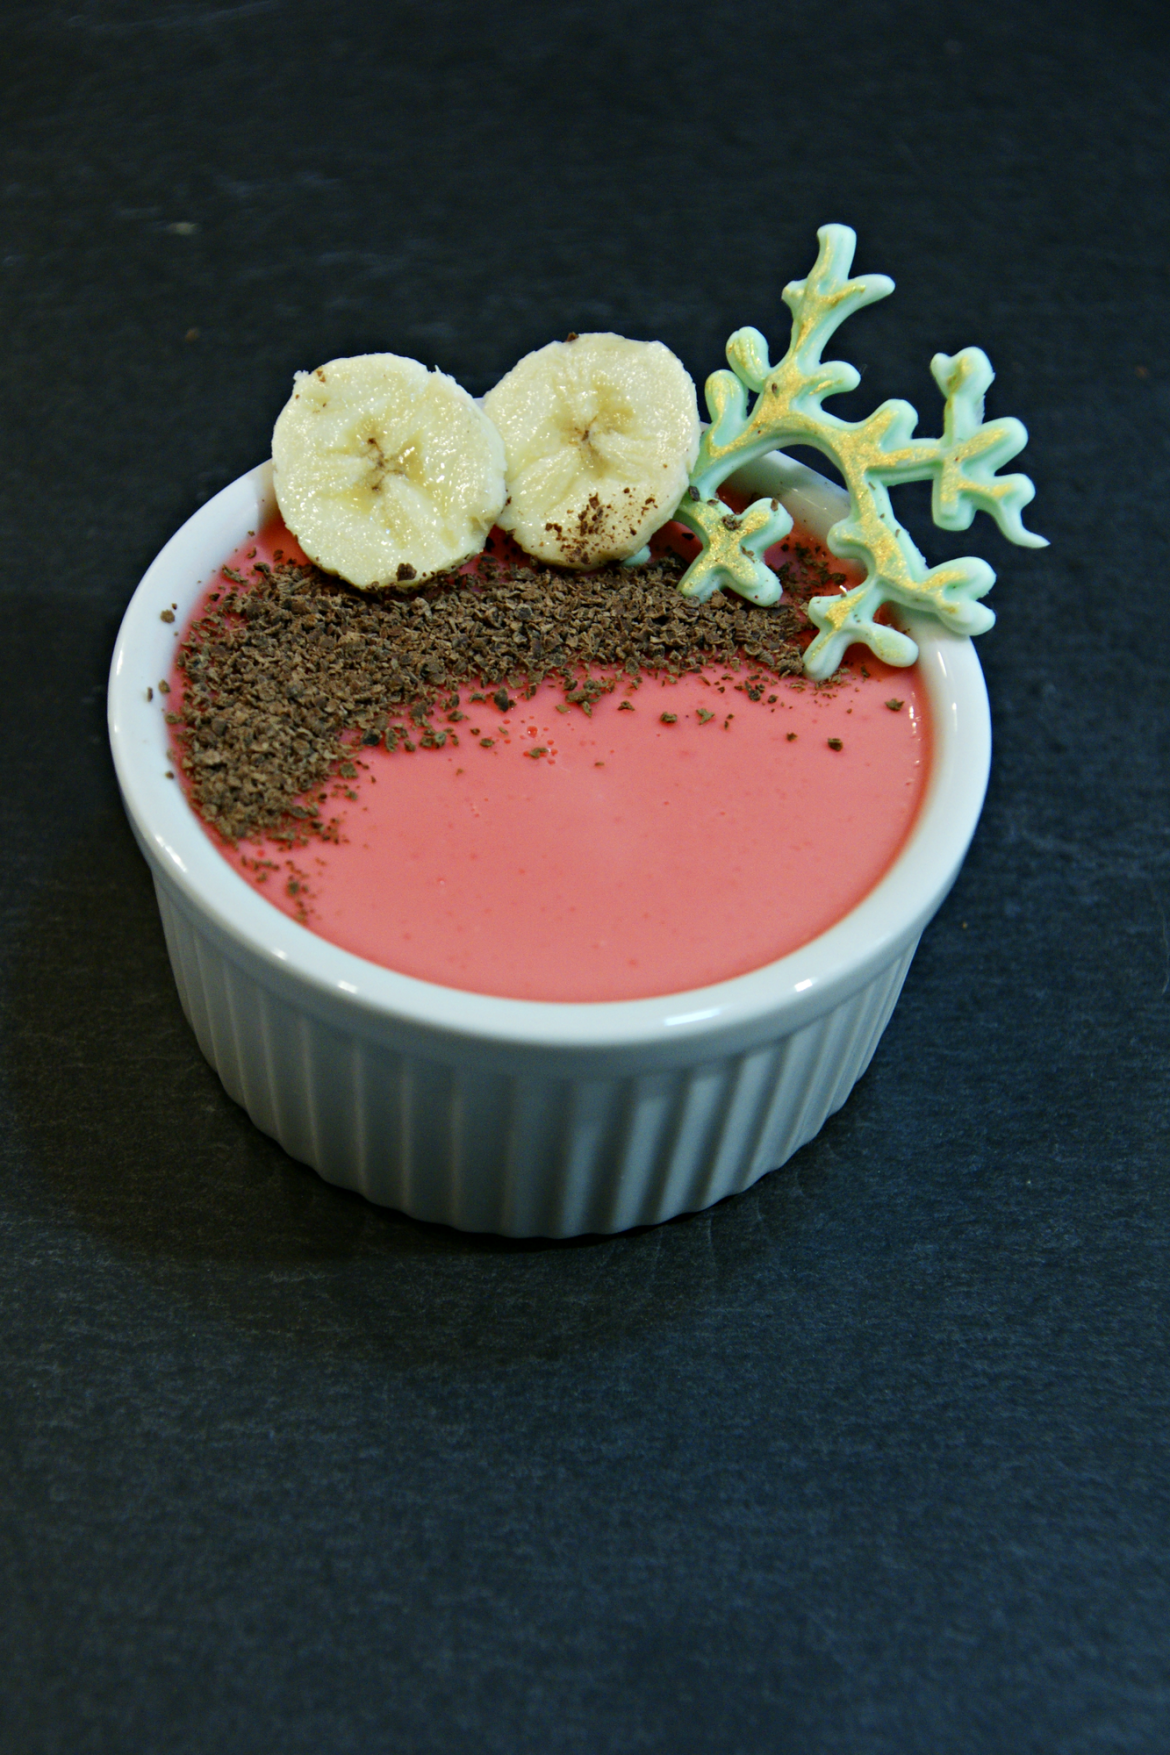 Strawberry flavored Pannacotta